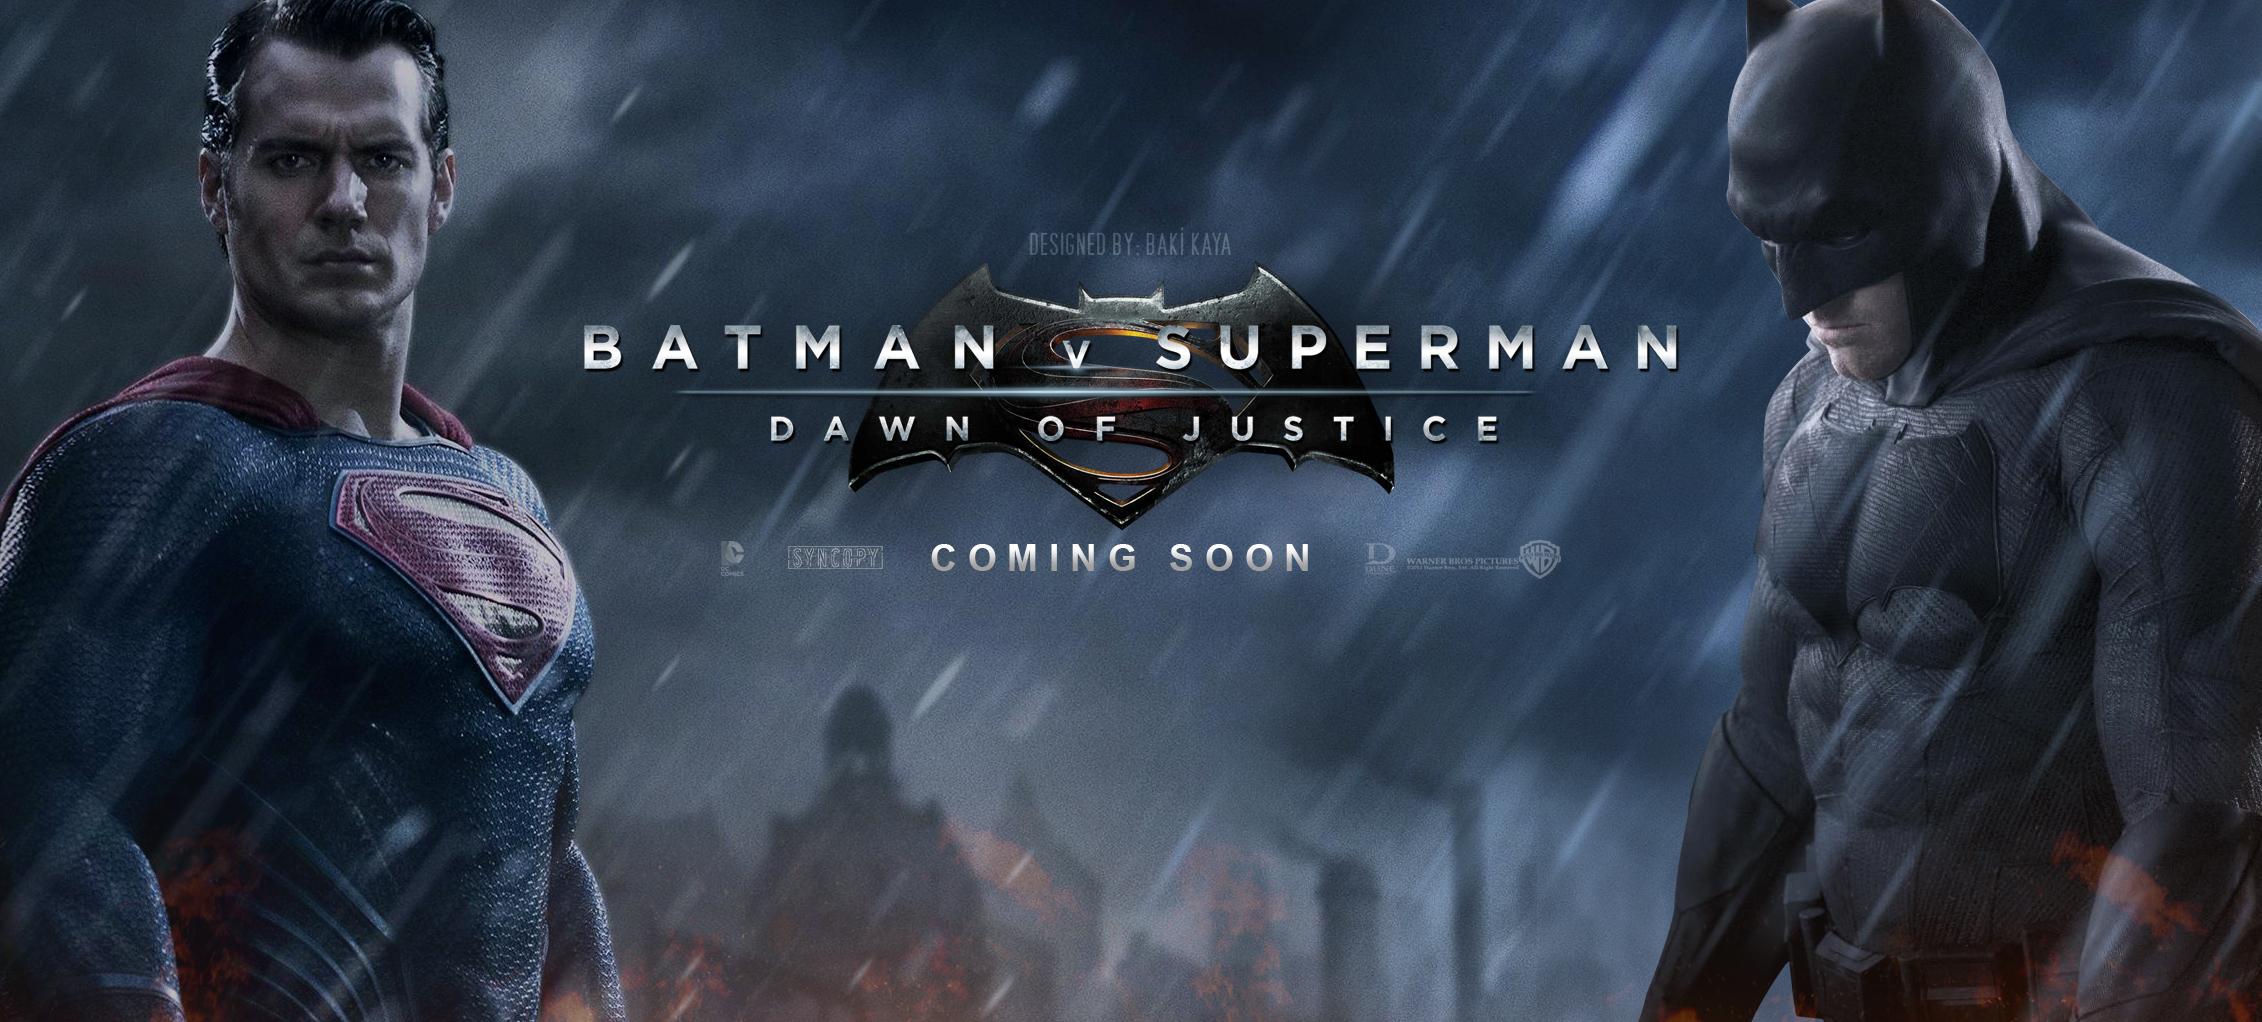 Batman v Superman Dawn Of Justice 2015 Movie Wallpaper 2262x1022